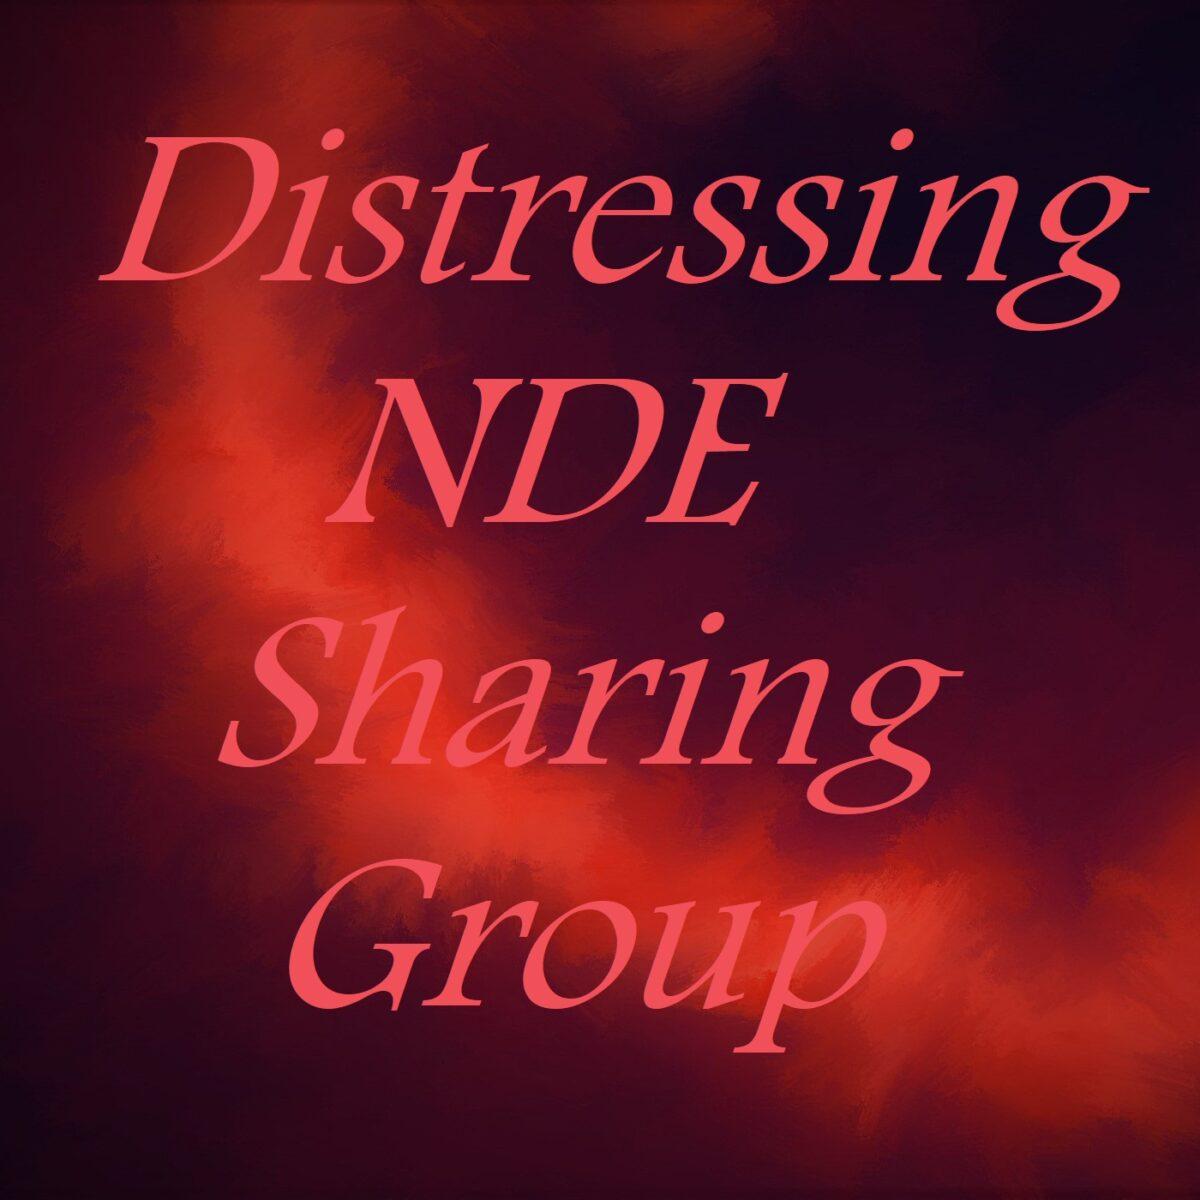 Distressing NDE Sharing Group